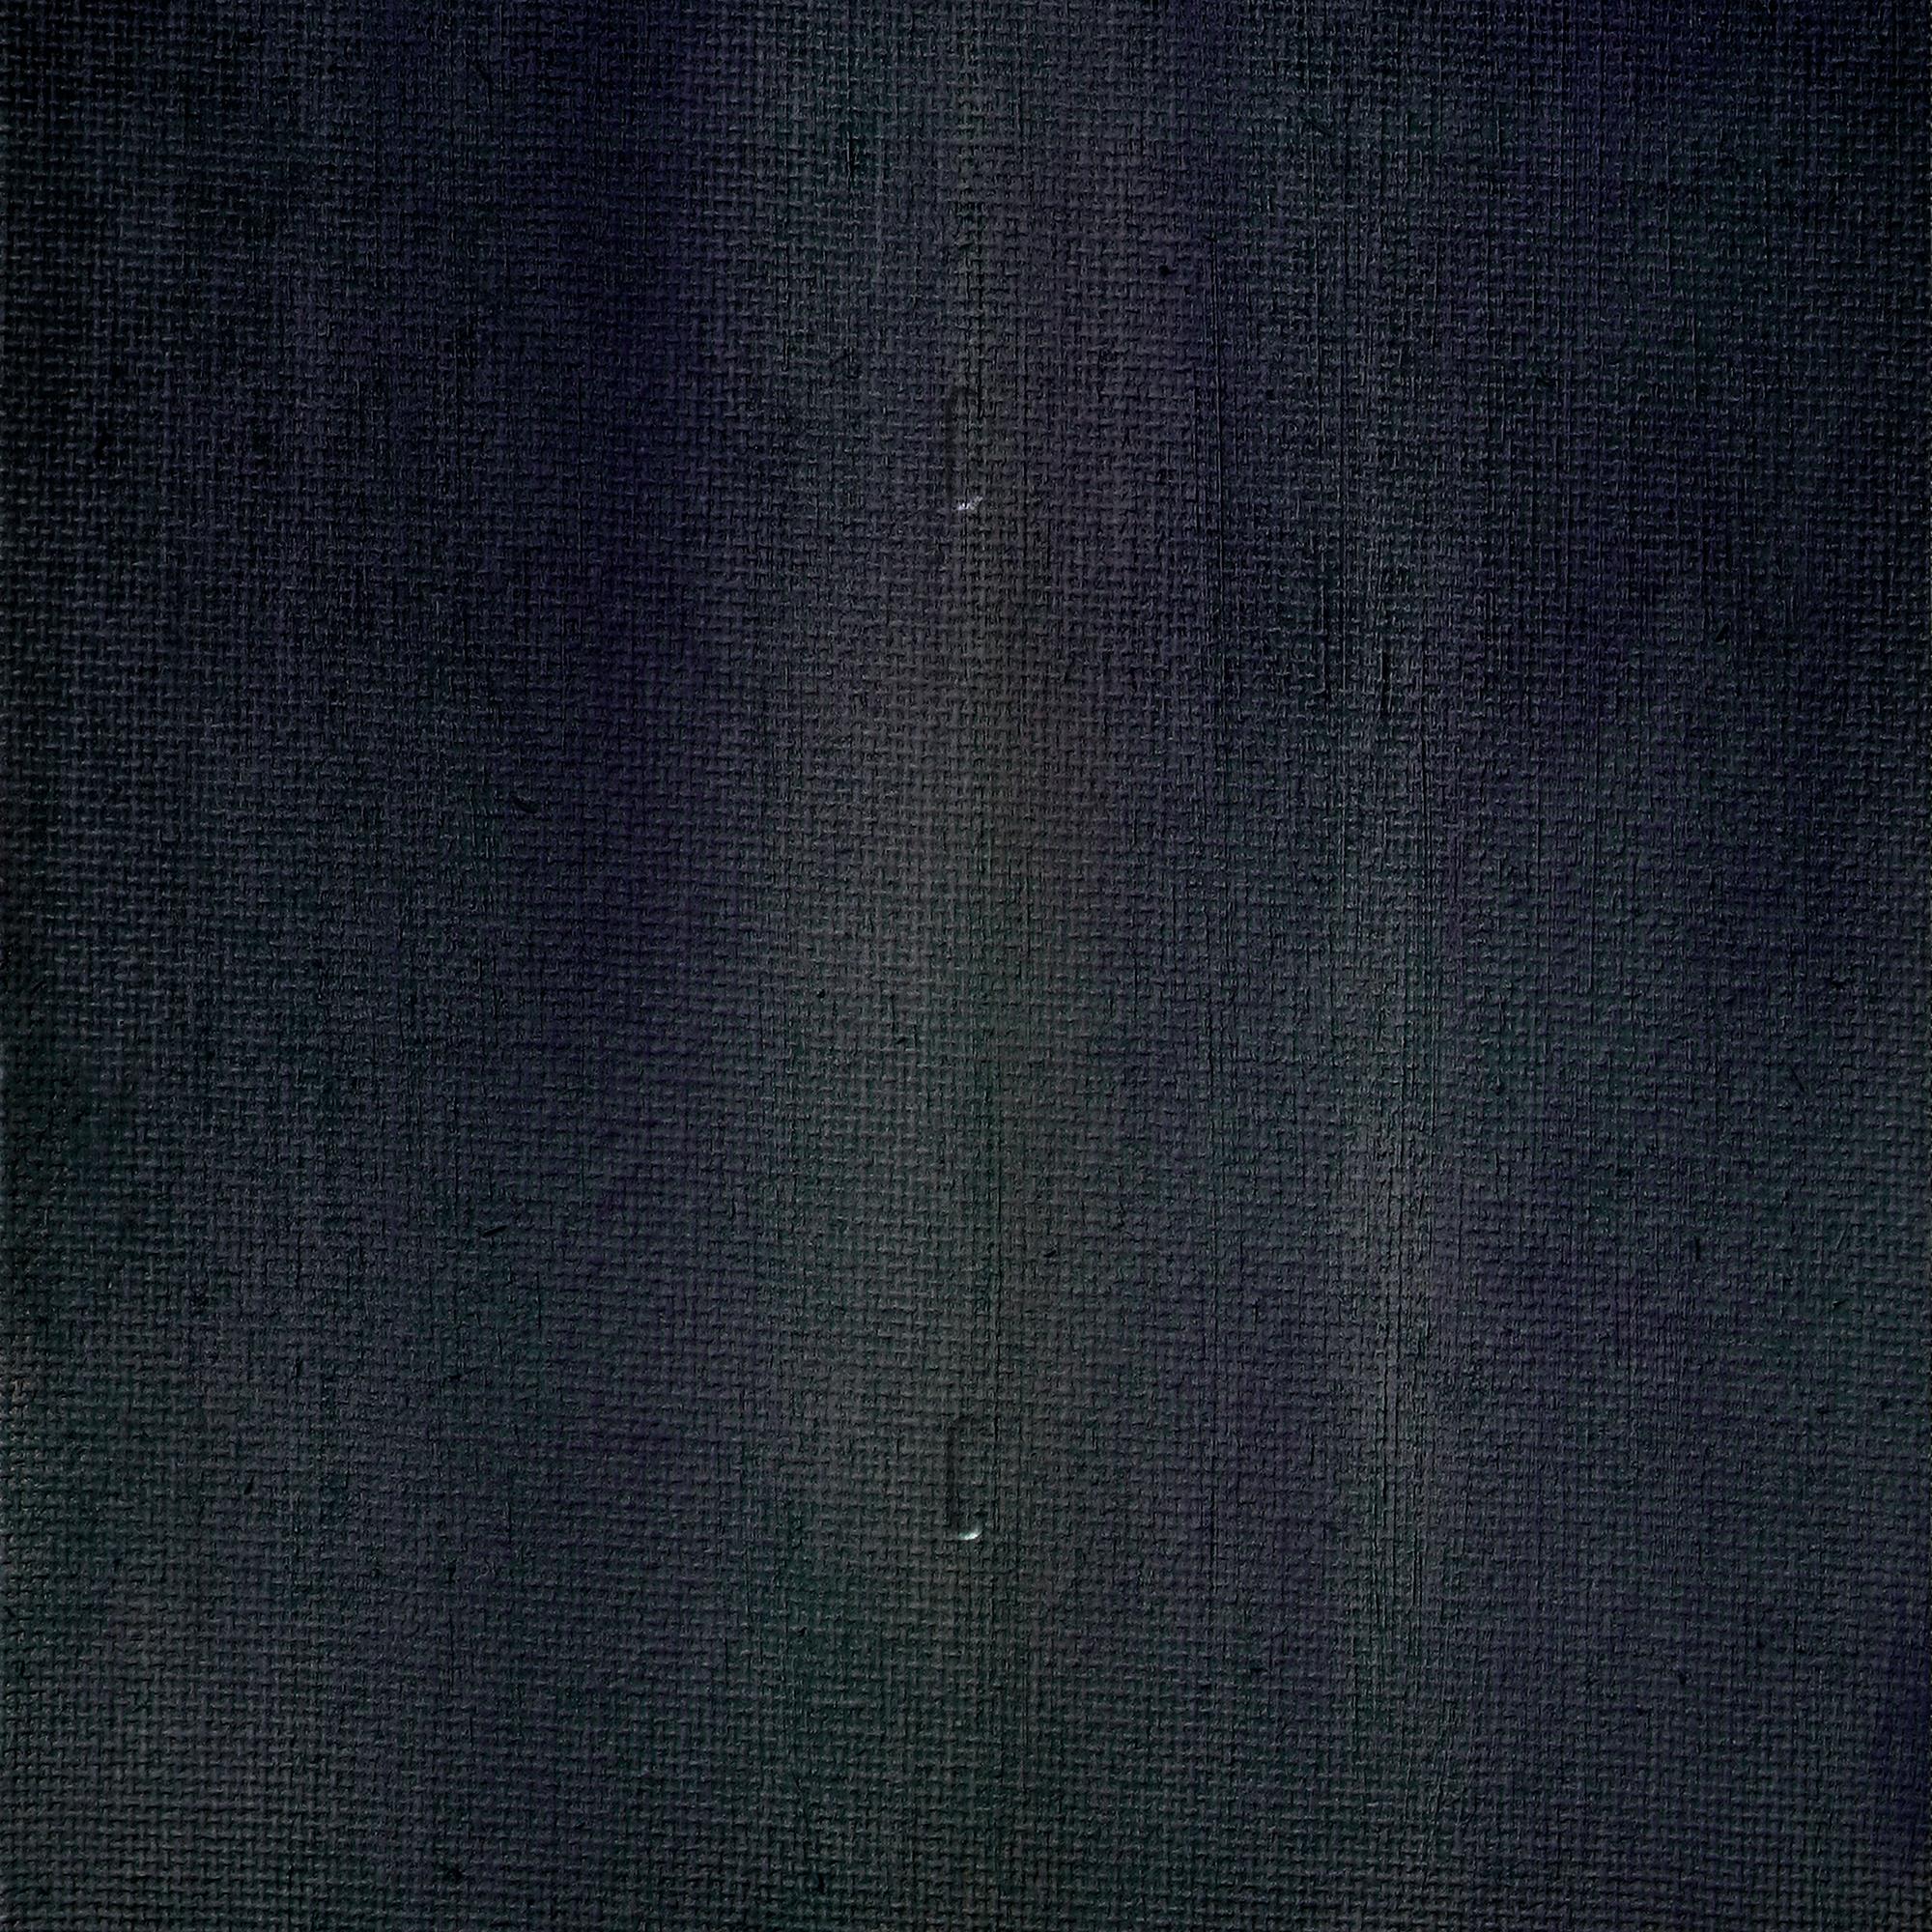 Solitude I Image